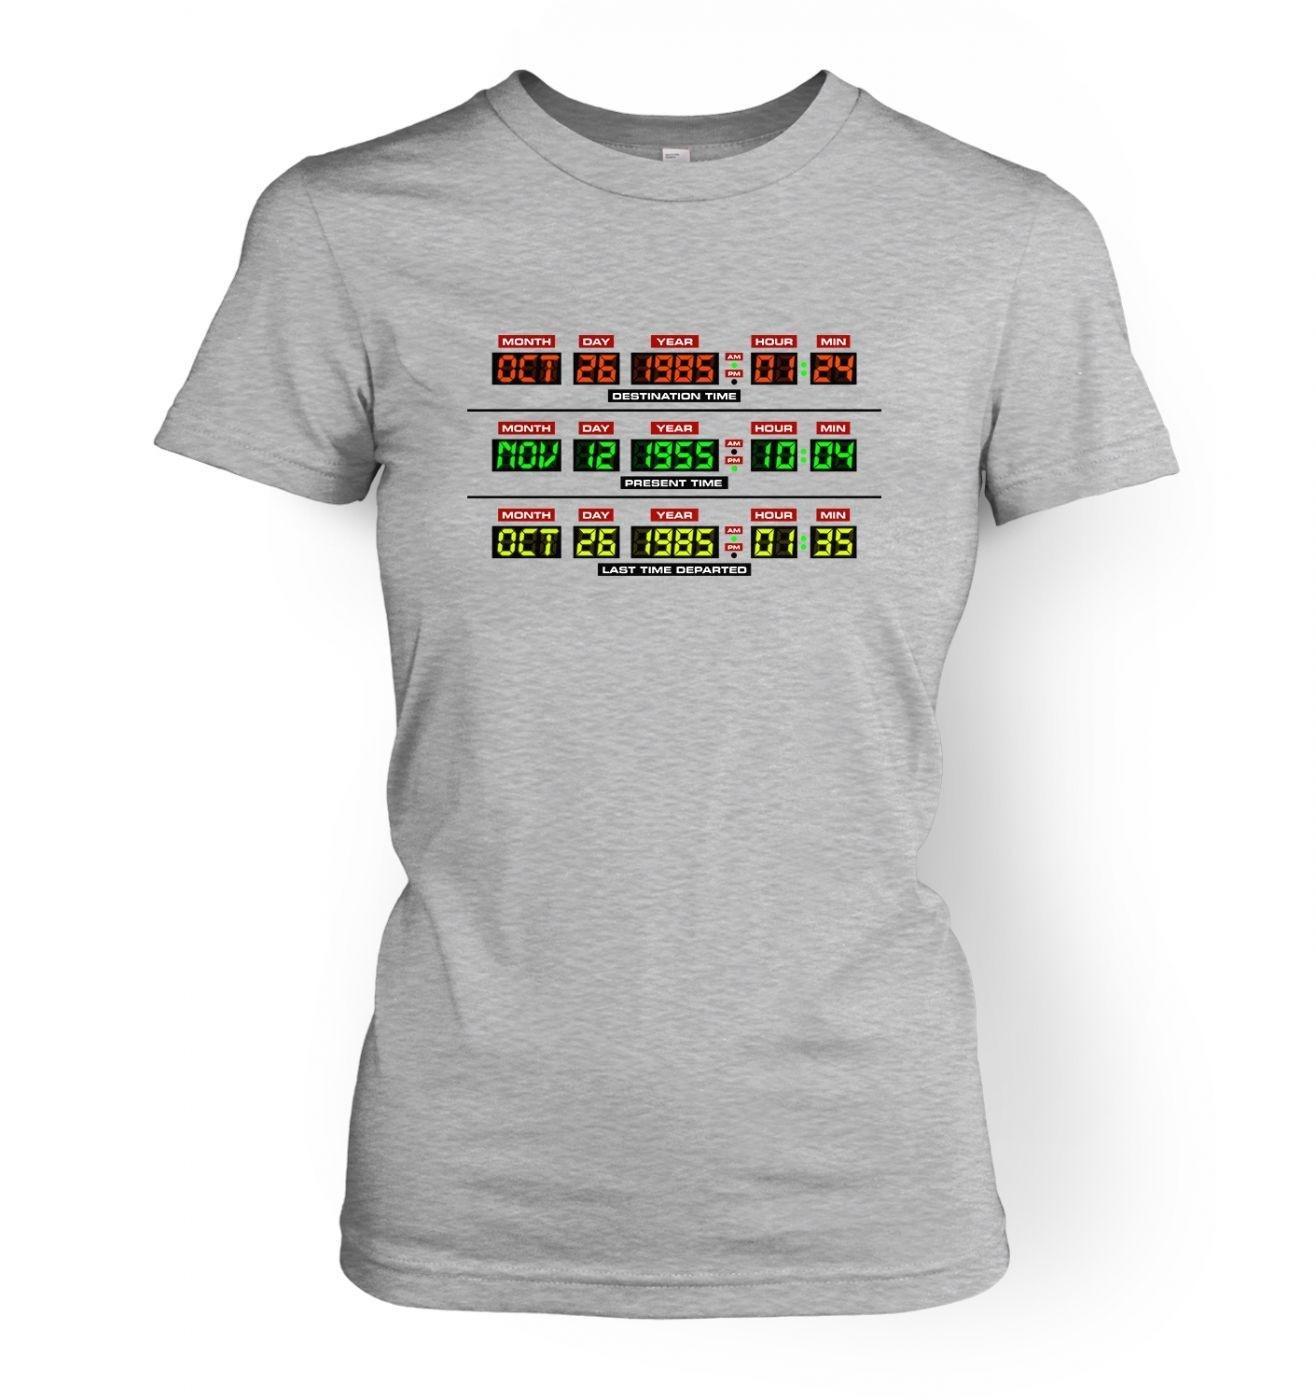 Delorean Dashboard women's t-shirt